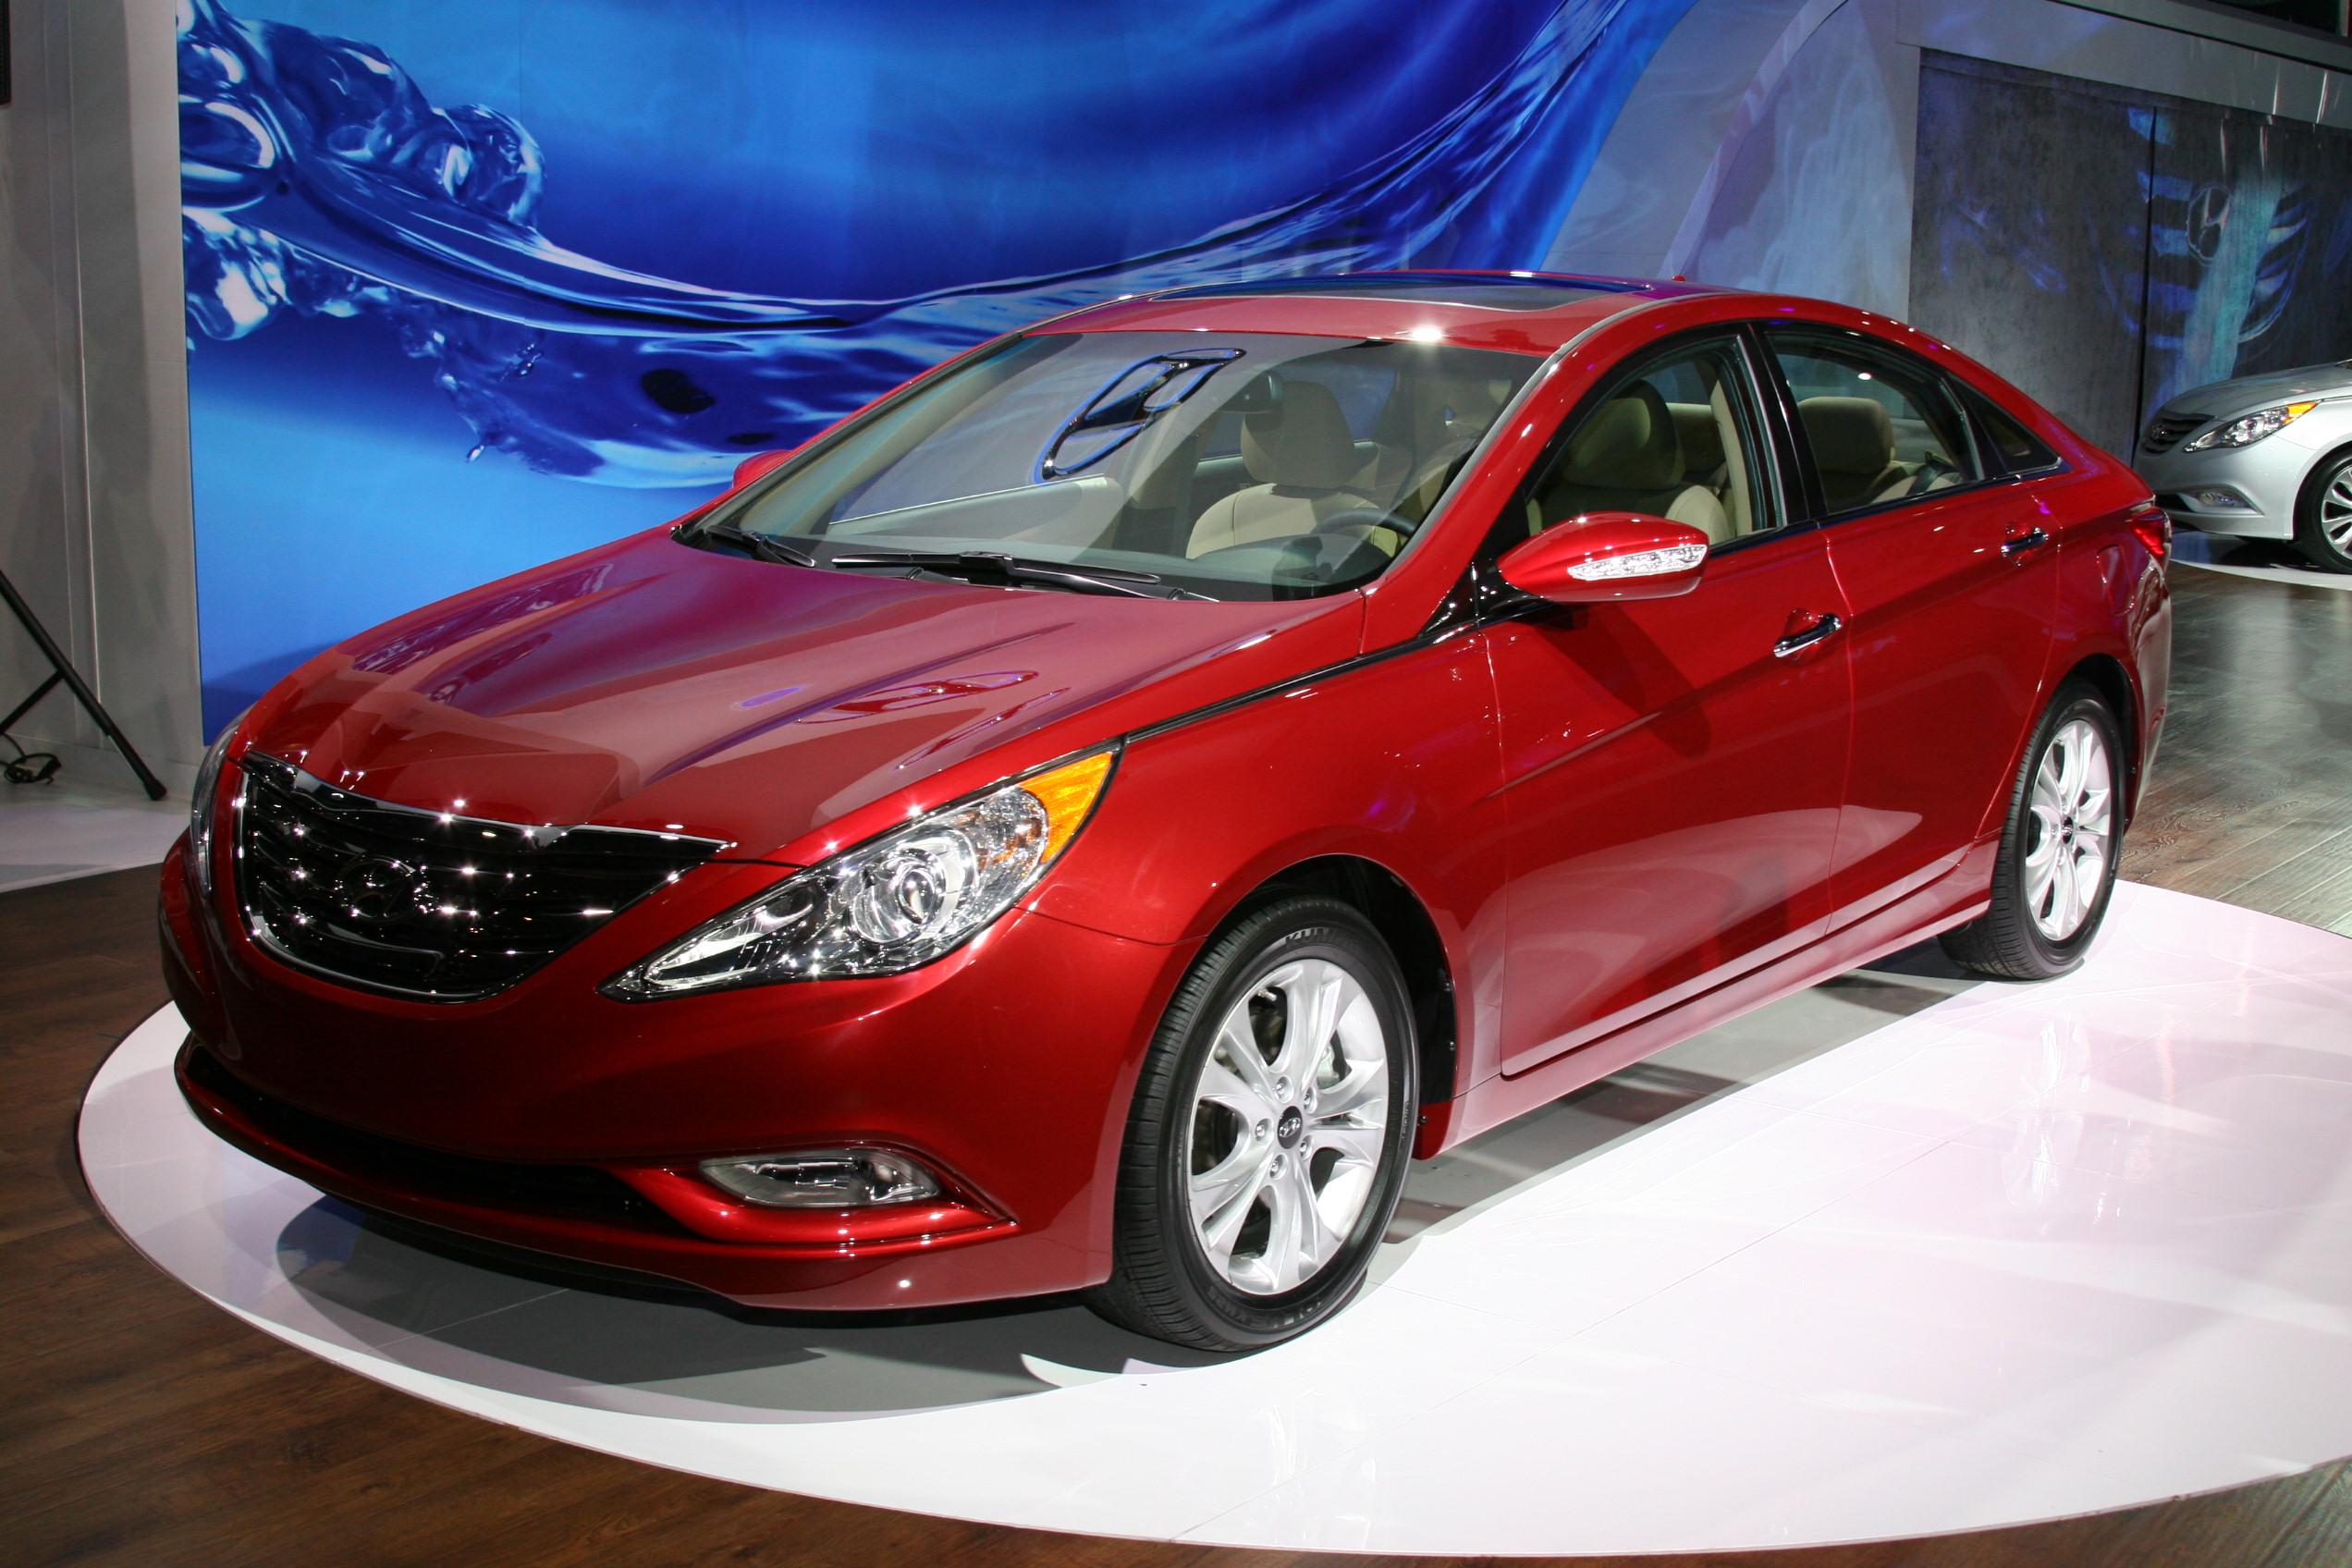 Honda Accord Versus Hyundai Sonata Major Differences